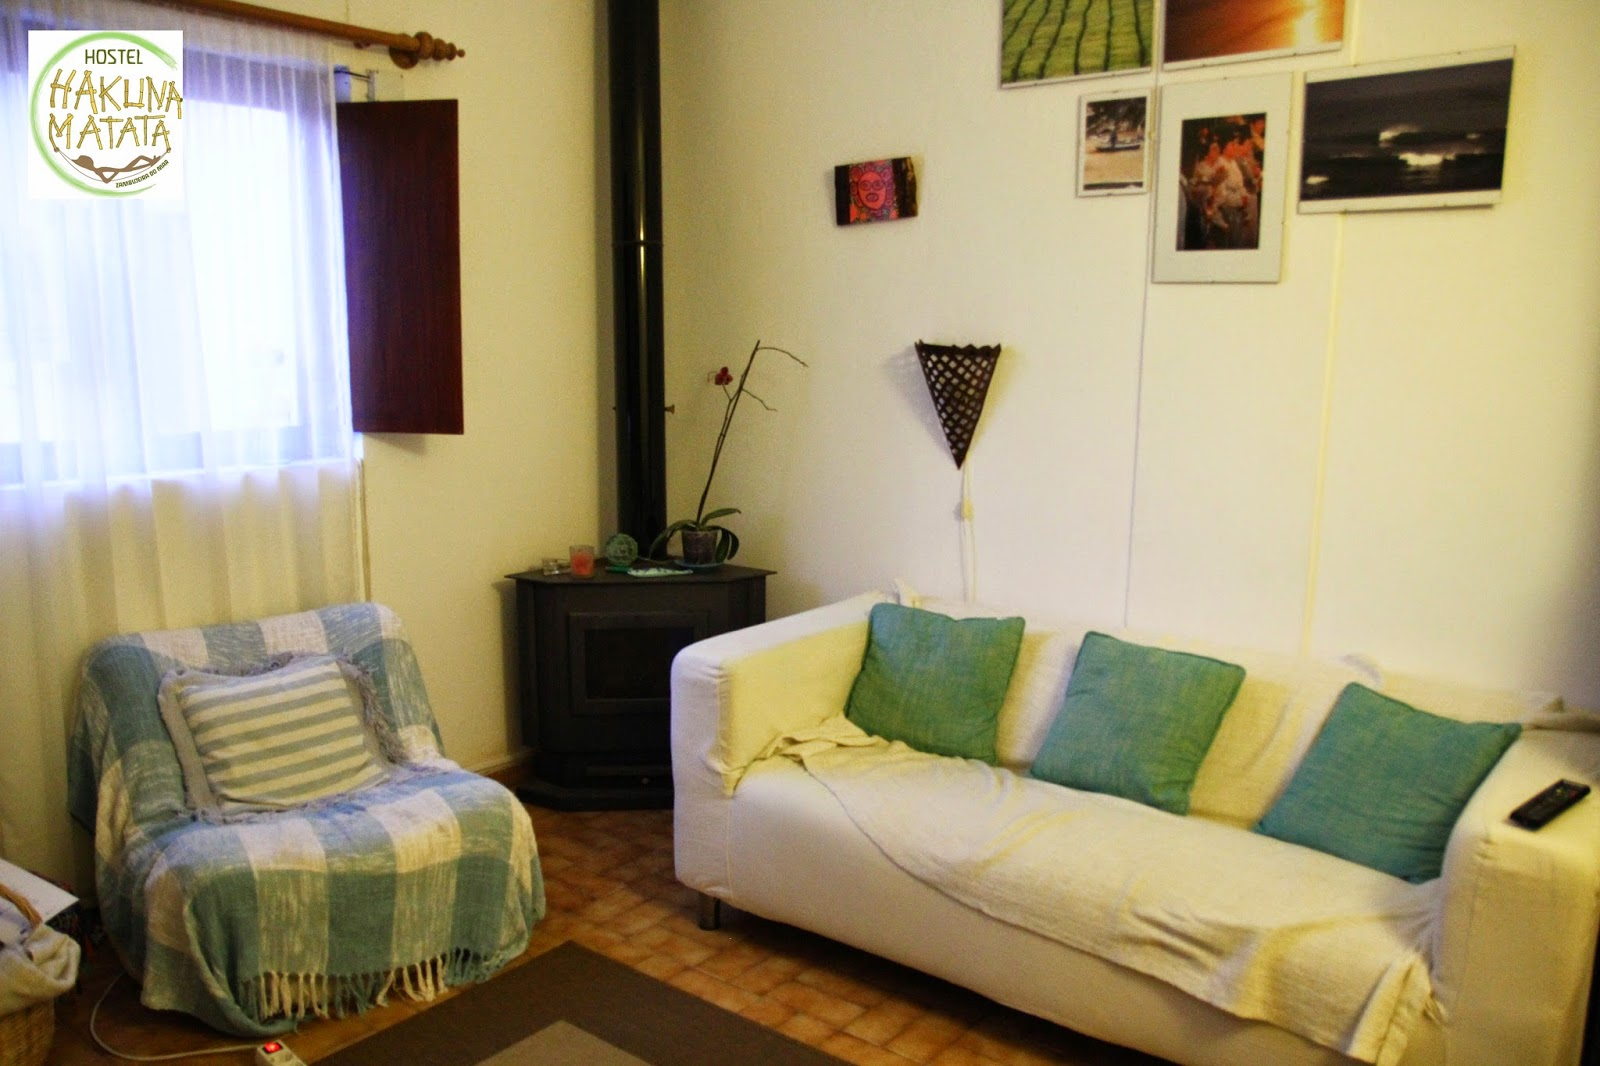 Onde dormir na Zambujeira do Mar - Hakuna Matata Hostel | Portugal